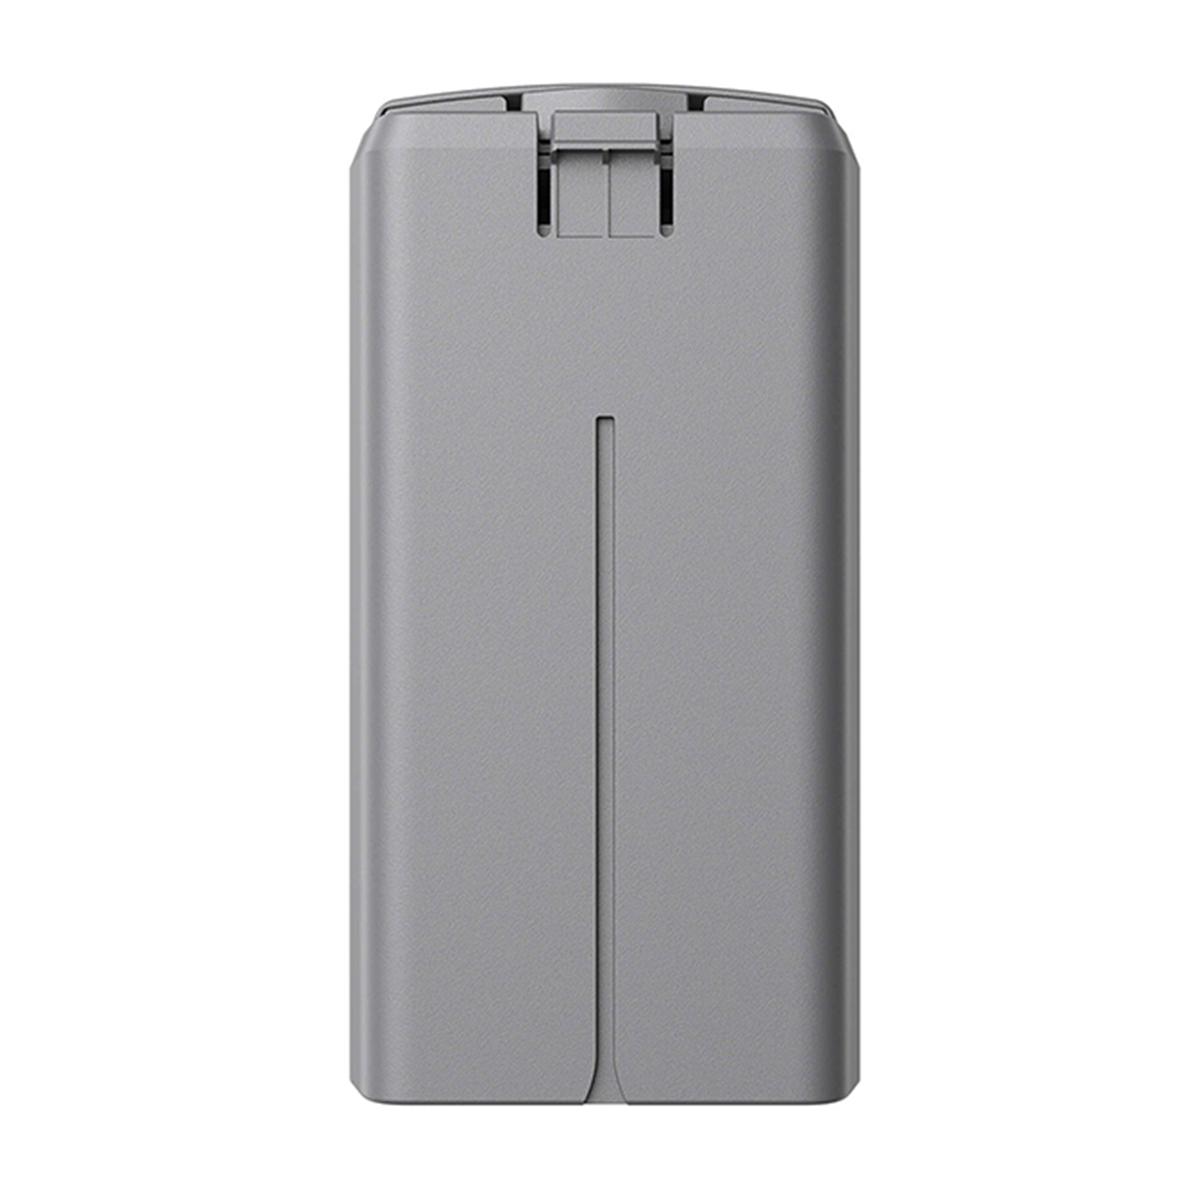 Bateria Recarregável Inteligente - Drone DJI Mavic Mini 2